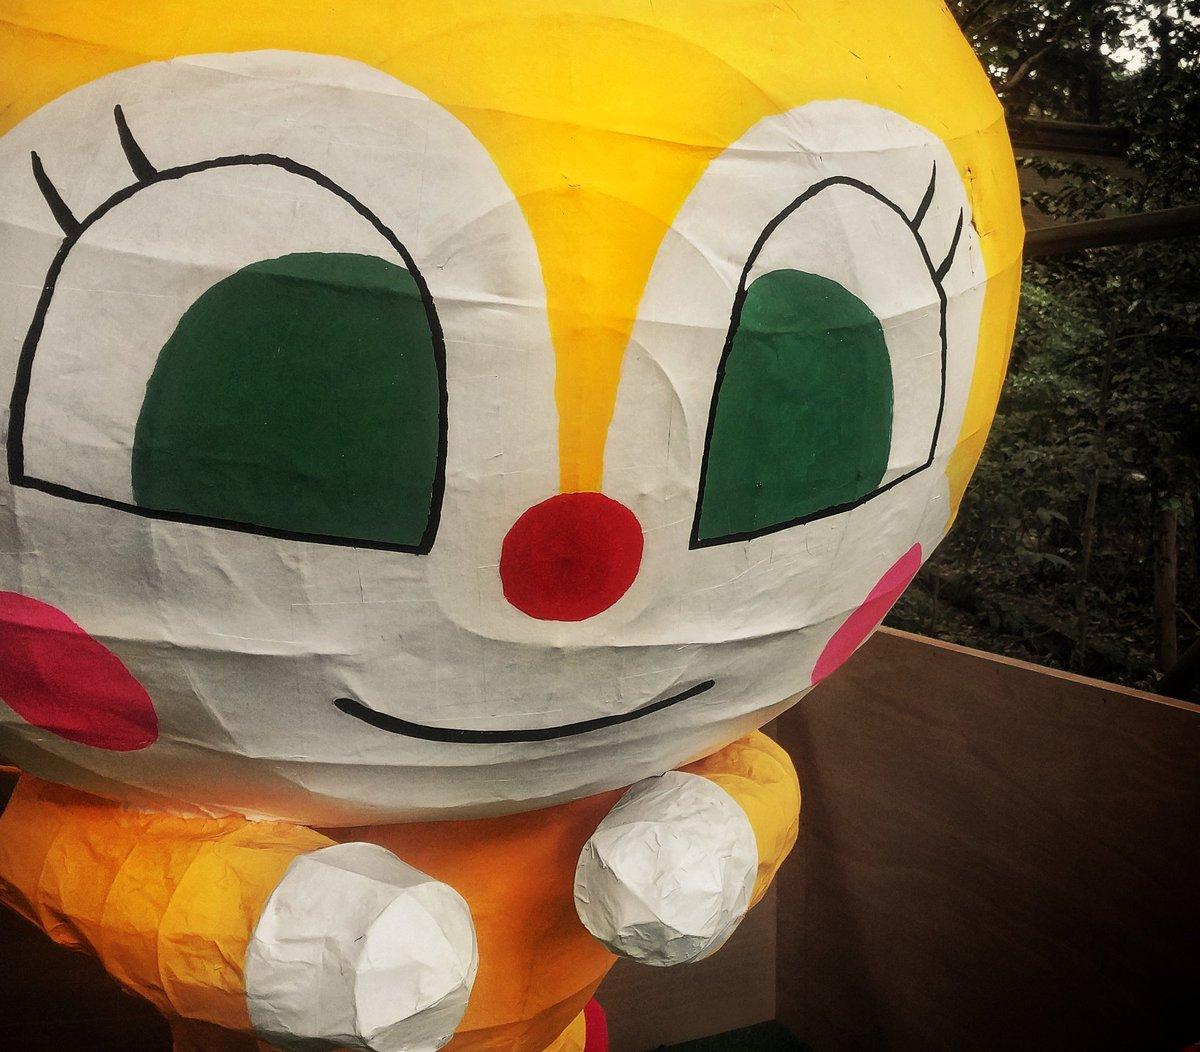 Paper.  #paper #papermache #papercraft #paint #art #handmade #anpanman #dokinchan #hachimangu #koenji #tokyo<br>http://pic.twitter.com/po4IAQ9O5z